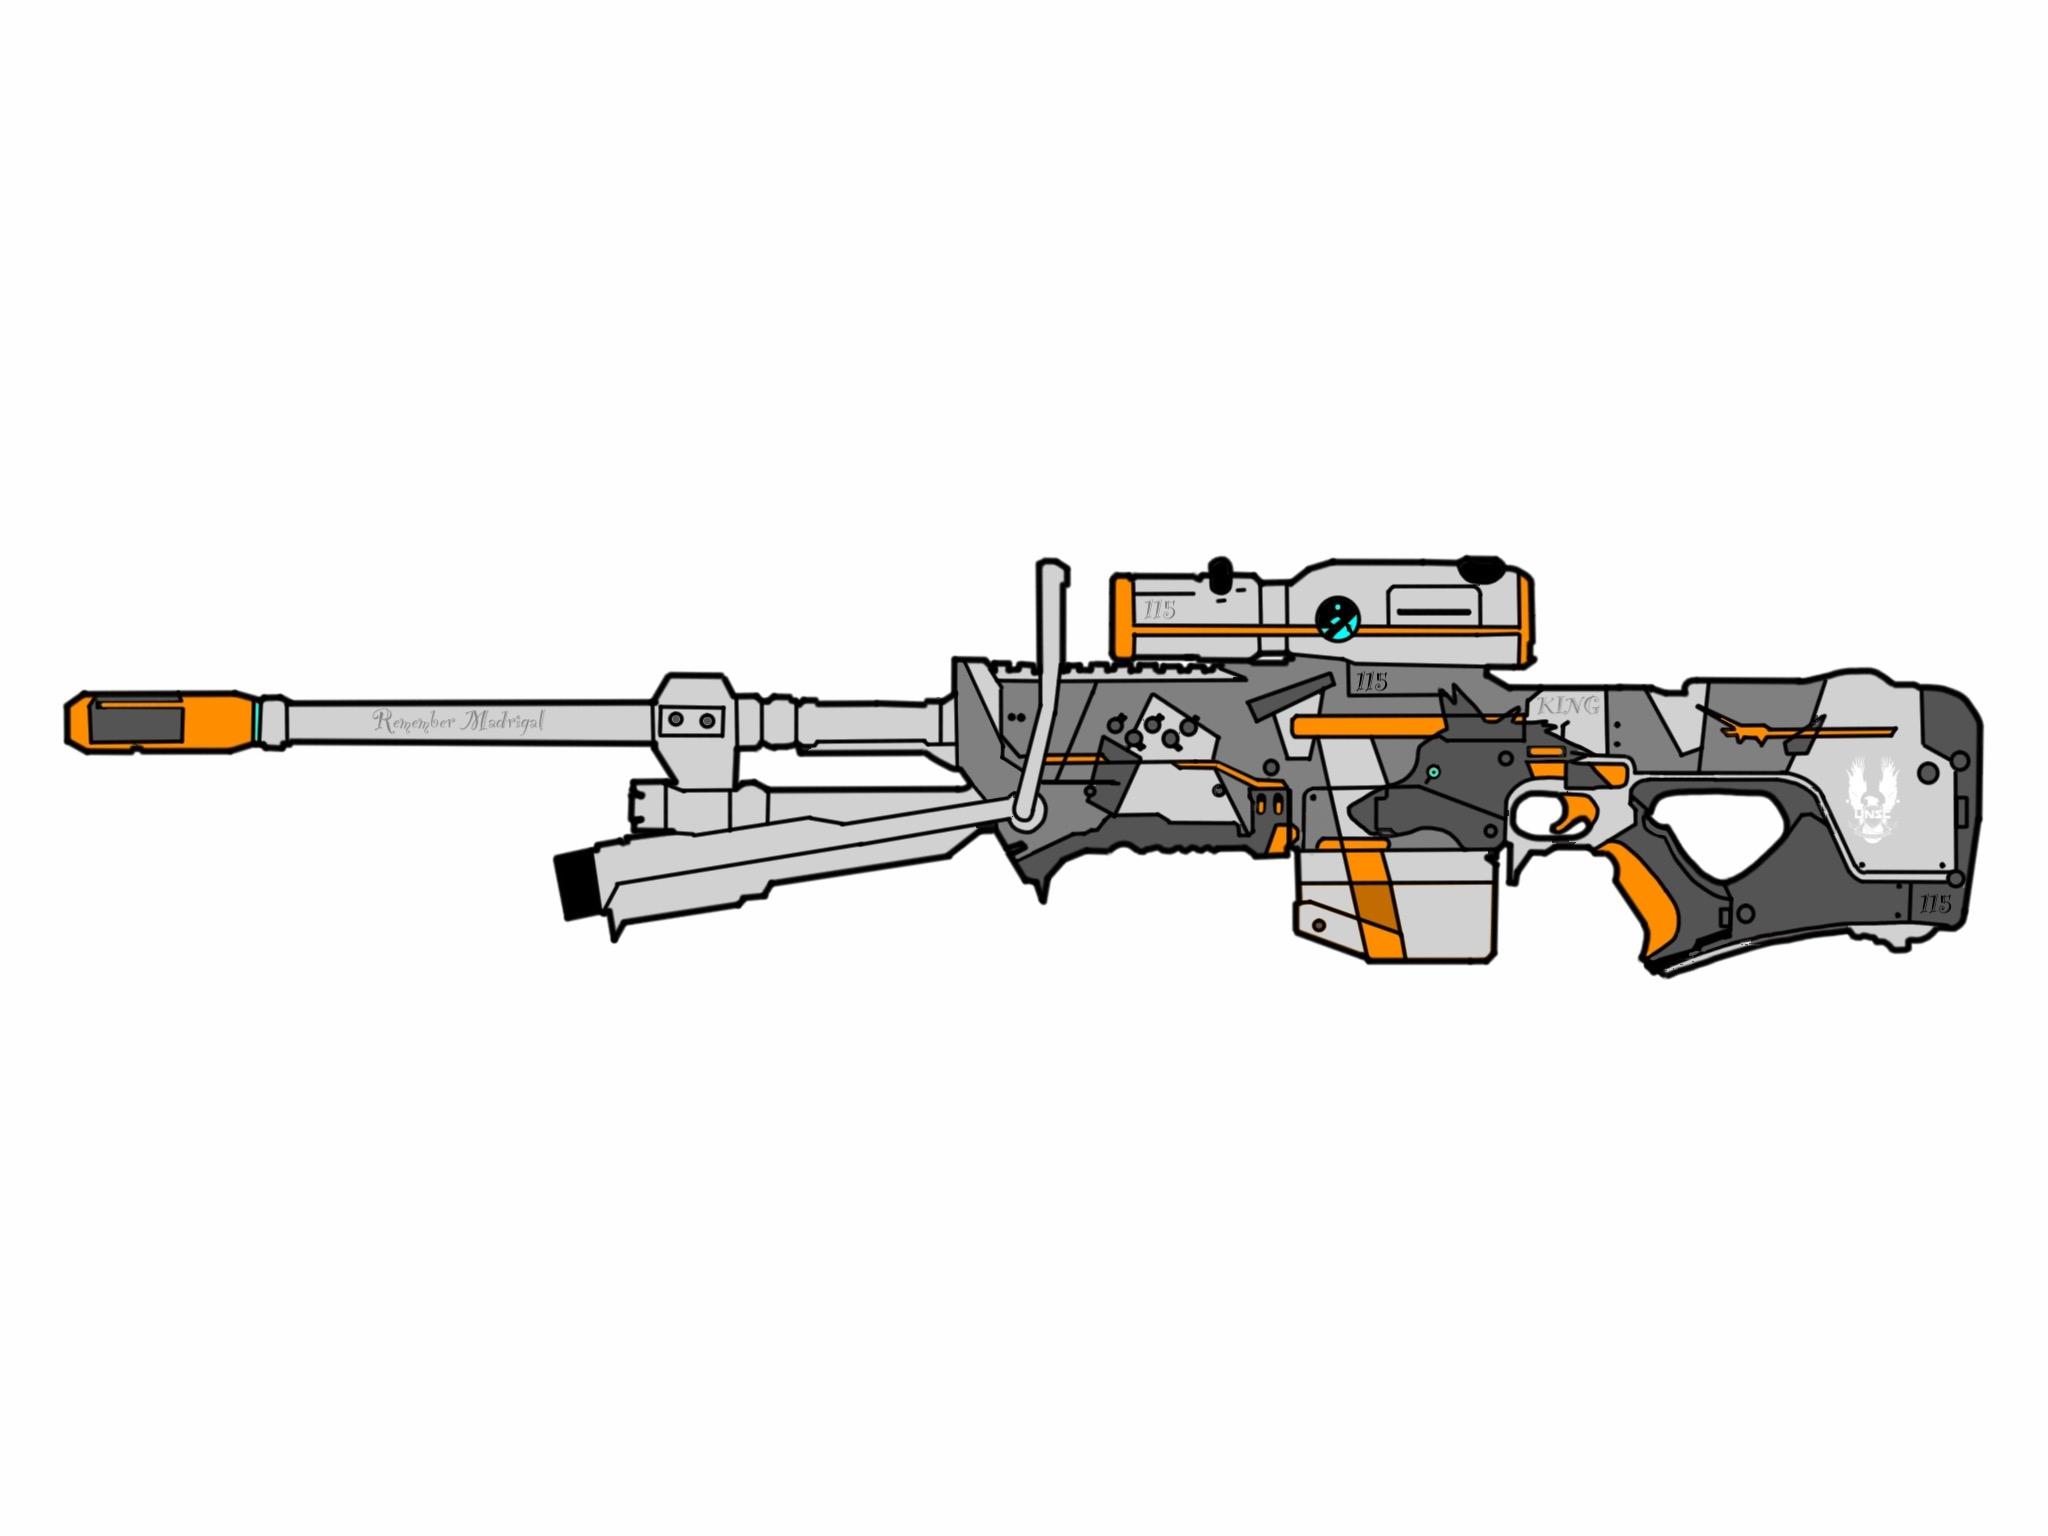 Sniper Rifle System 99-Series 5-B Anti-Matériel